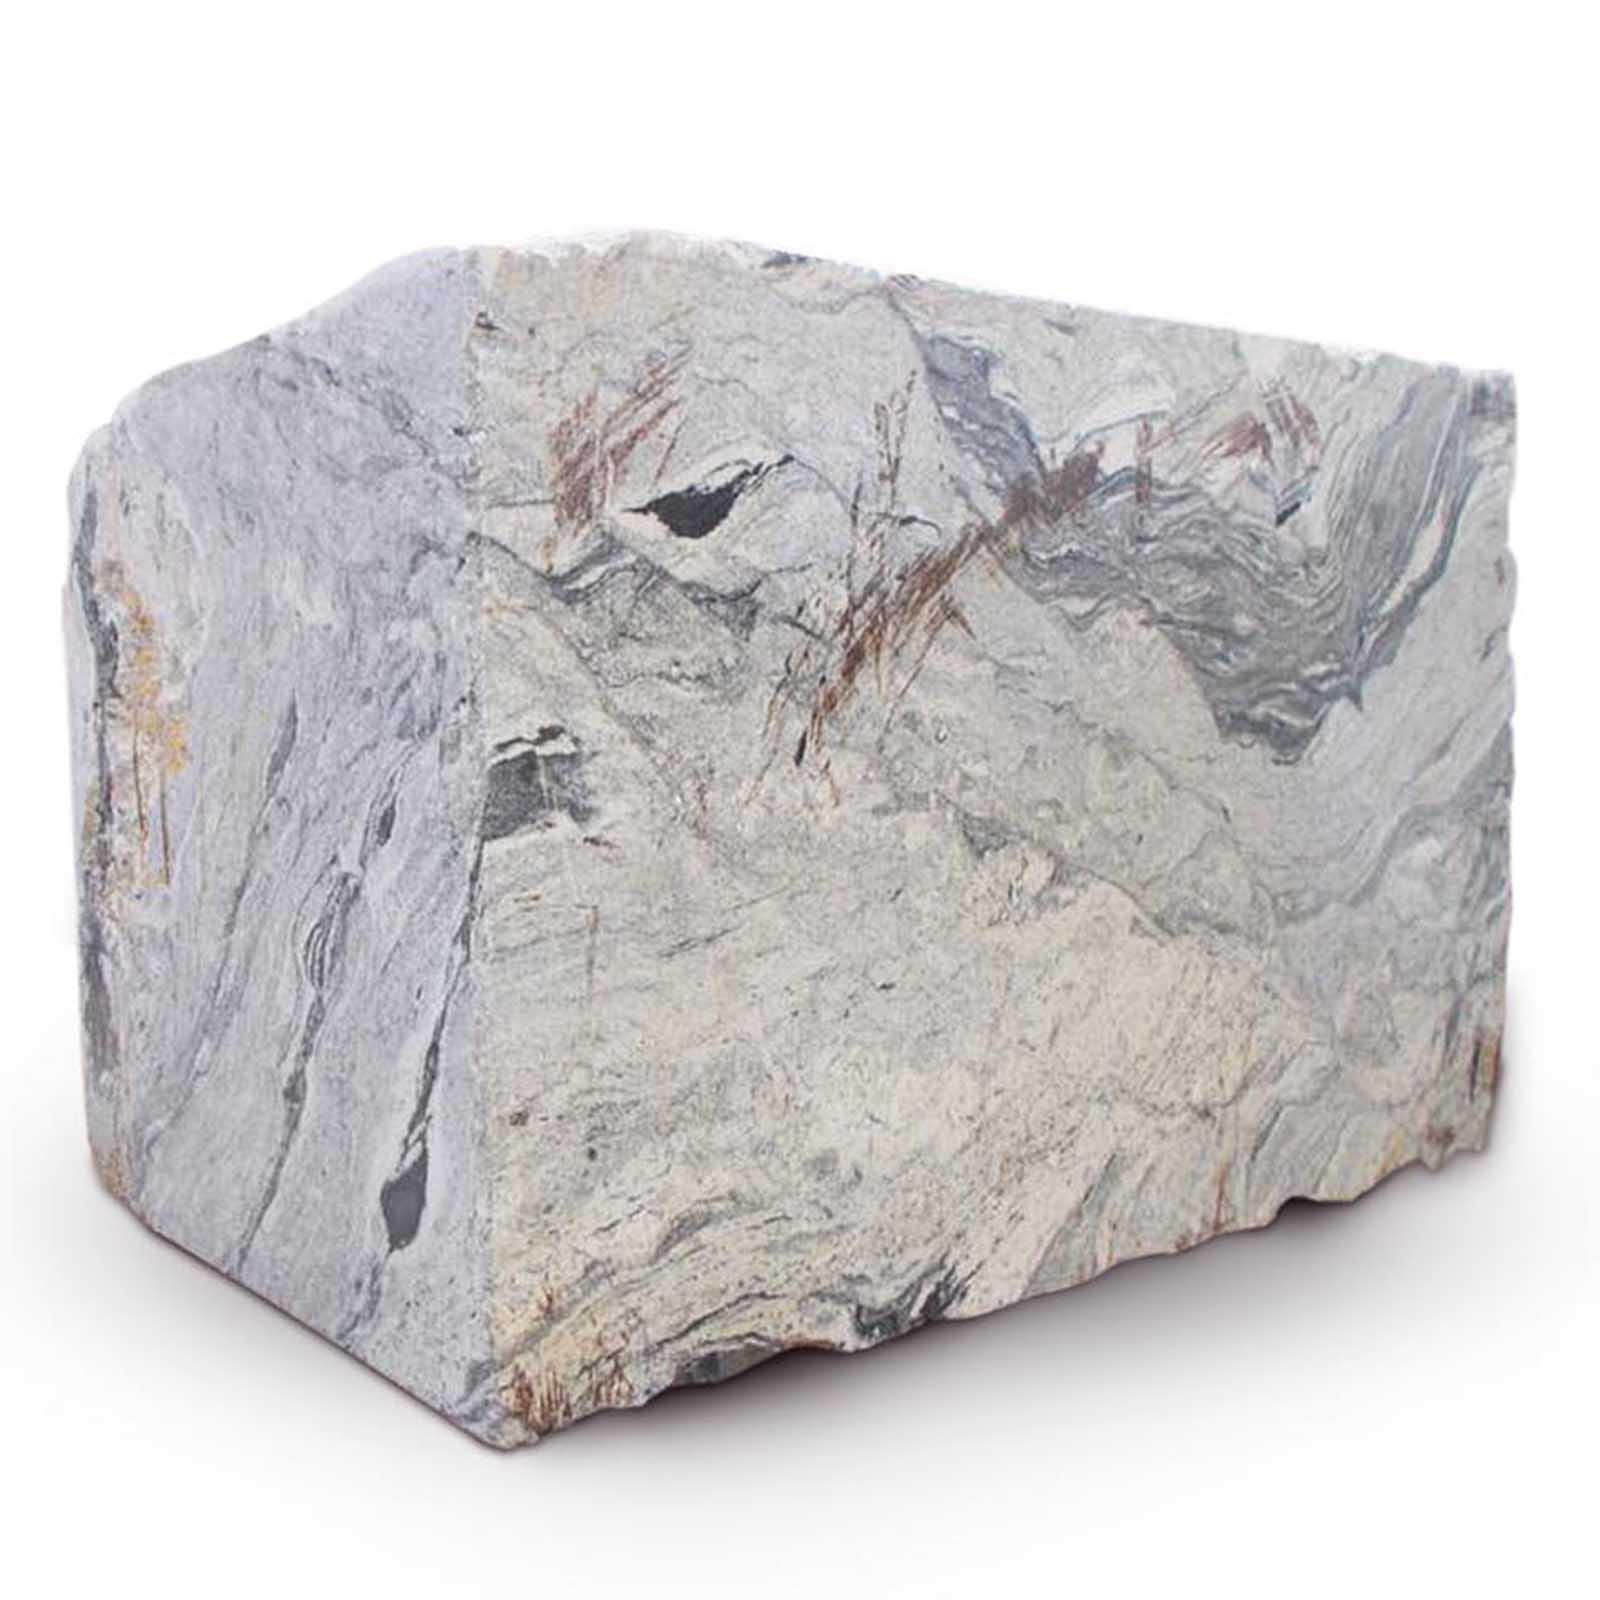 White Granite Blocks Viscon Direct From Indian Granite Quarries